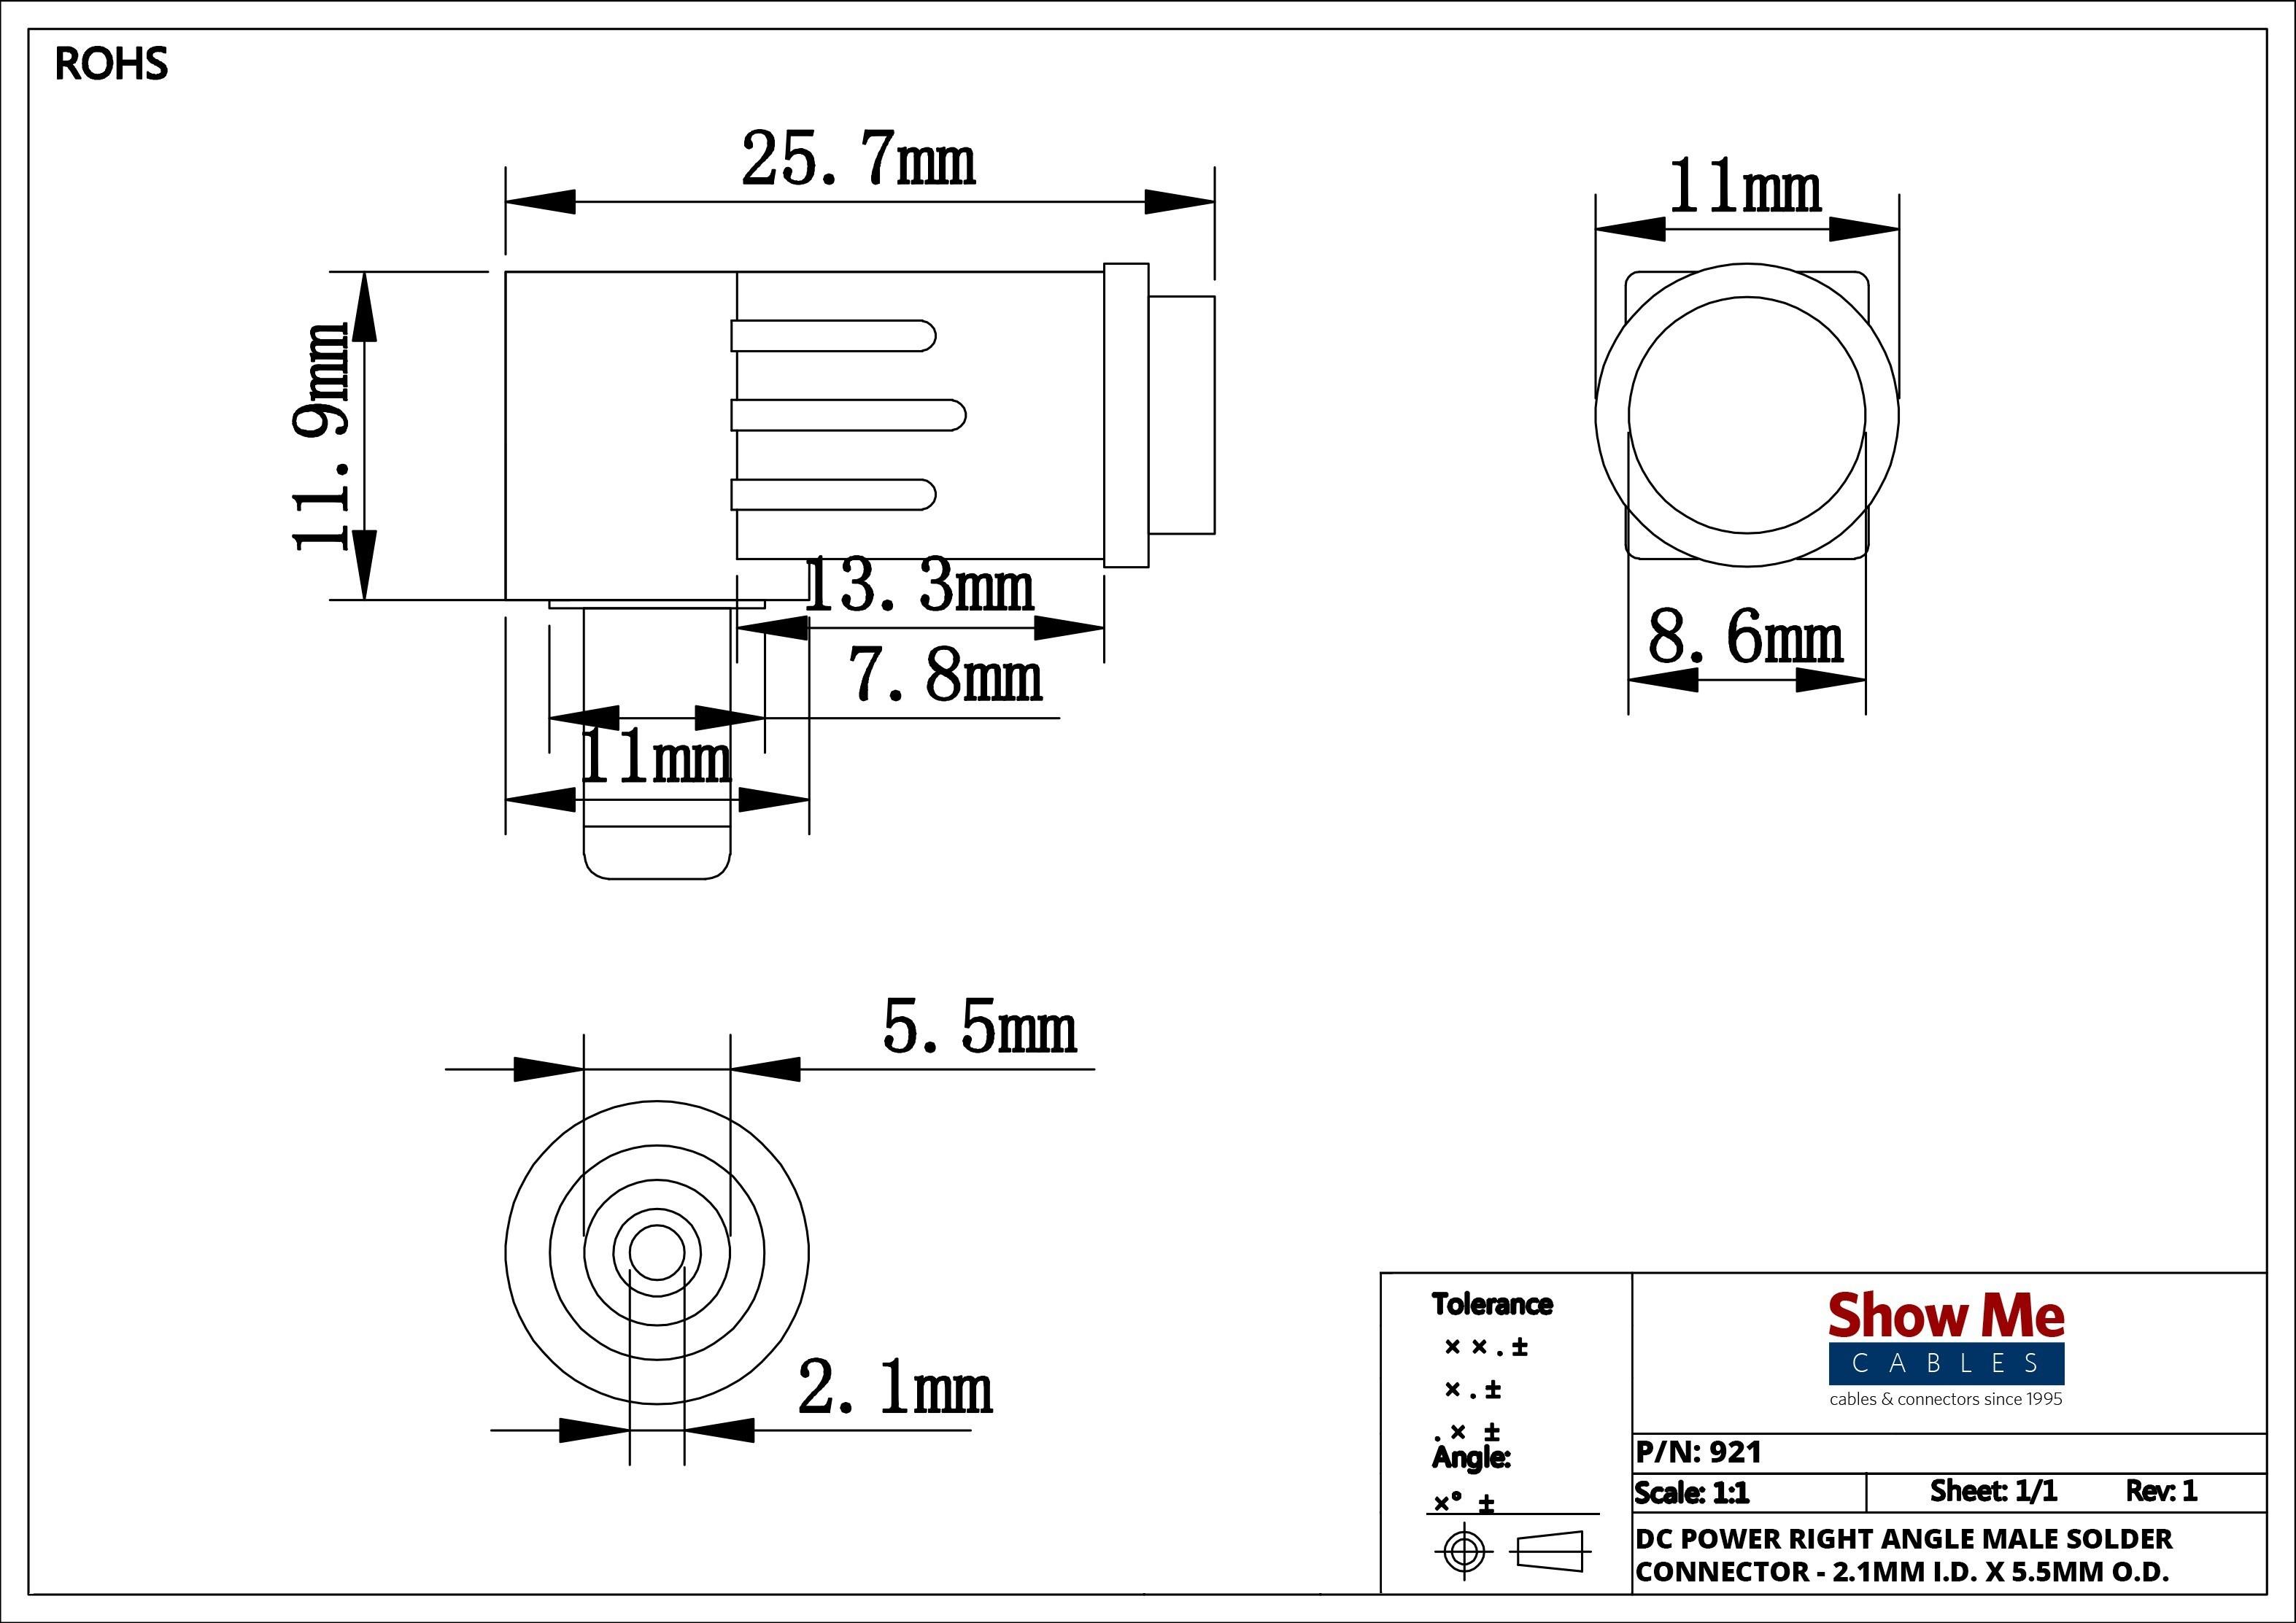 electrical circuit diagram new 3 5 mm jack wiring diagram fresh 2 rh originalstylophone Headphone Jack Wiring 3 5Mm Mono Jack Wiring Diagram